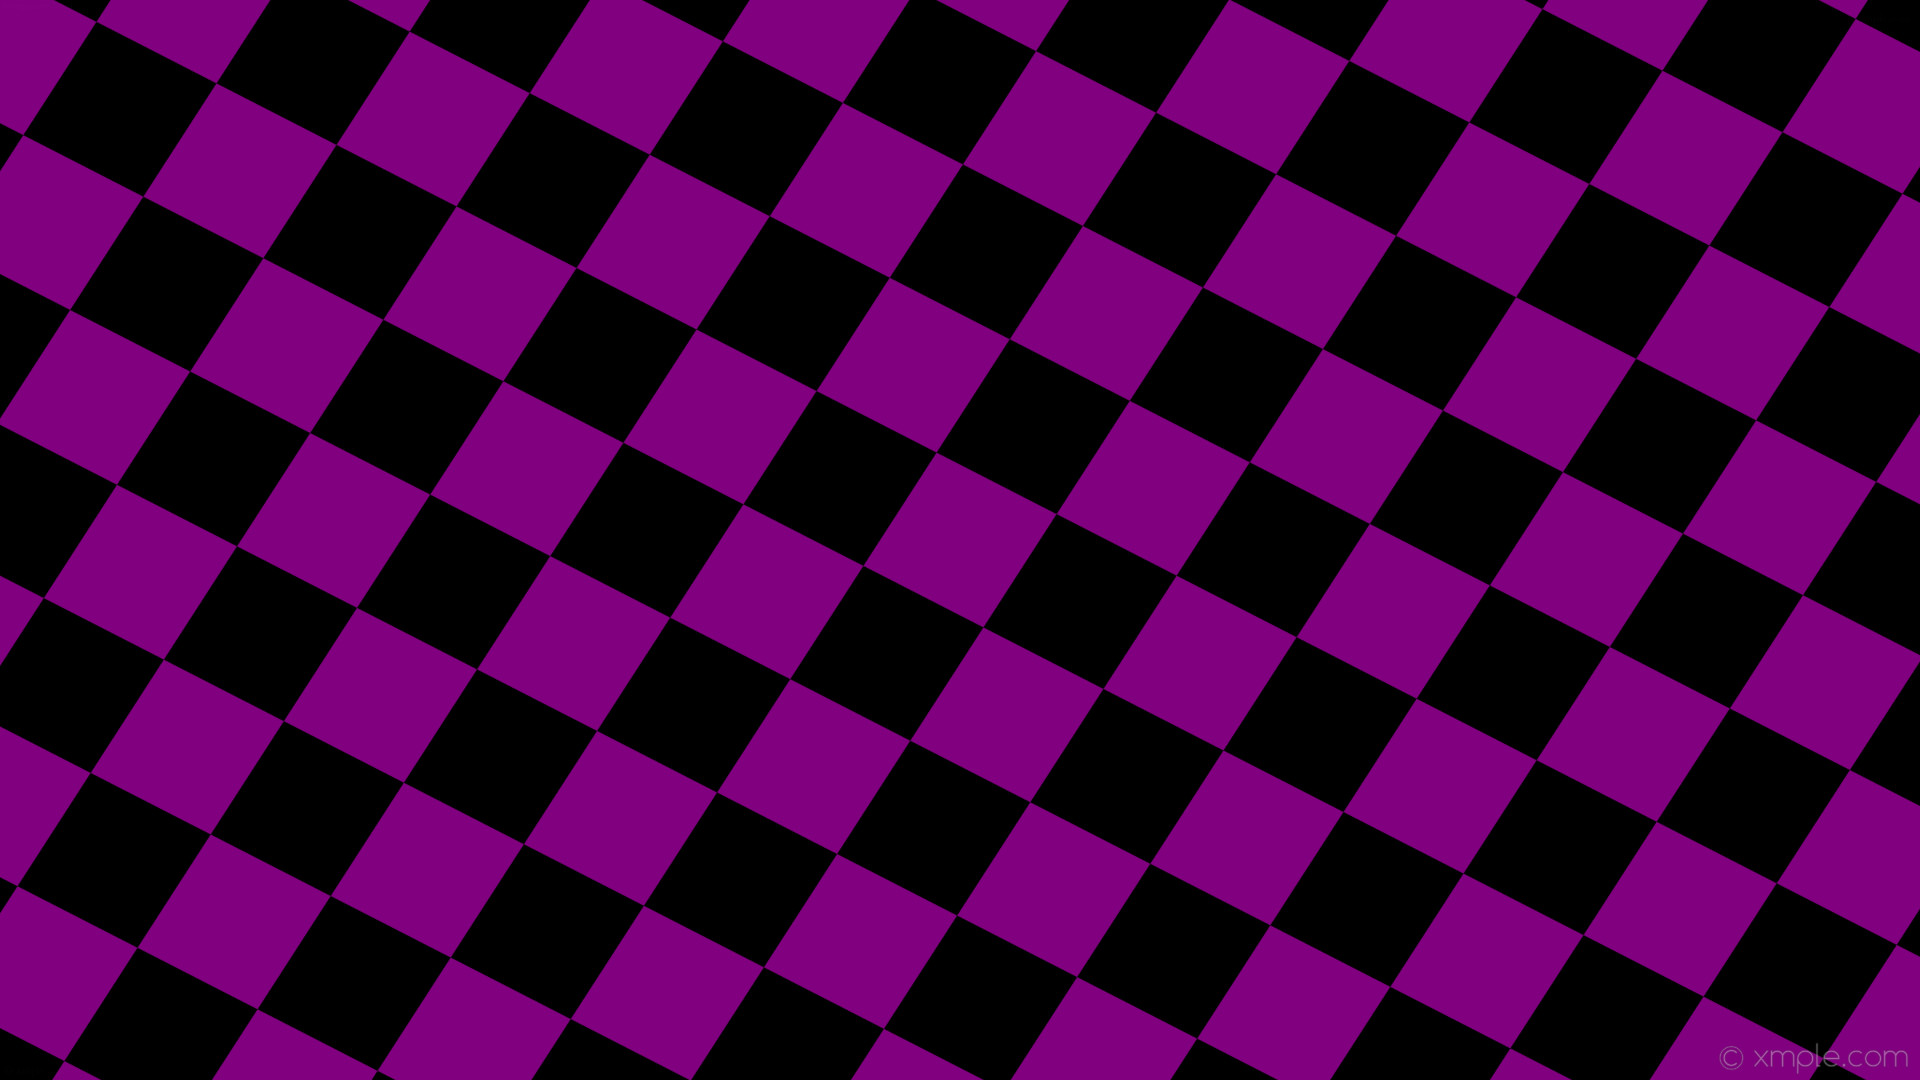 wallpaper black lozenge purple diamond rhombus #800080 #000000 15° 200px  181px